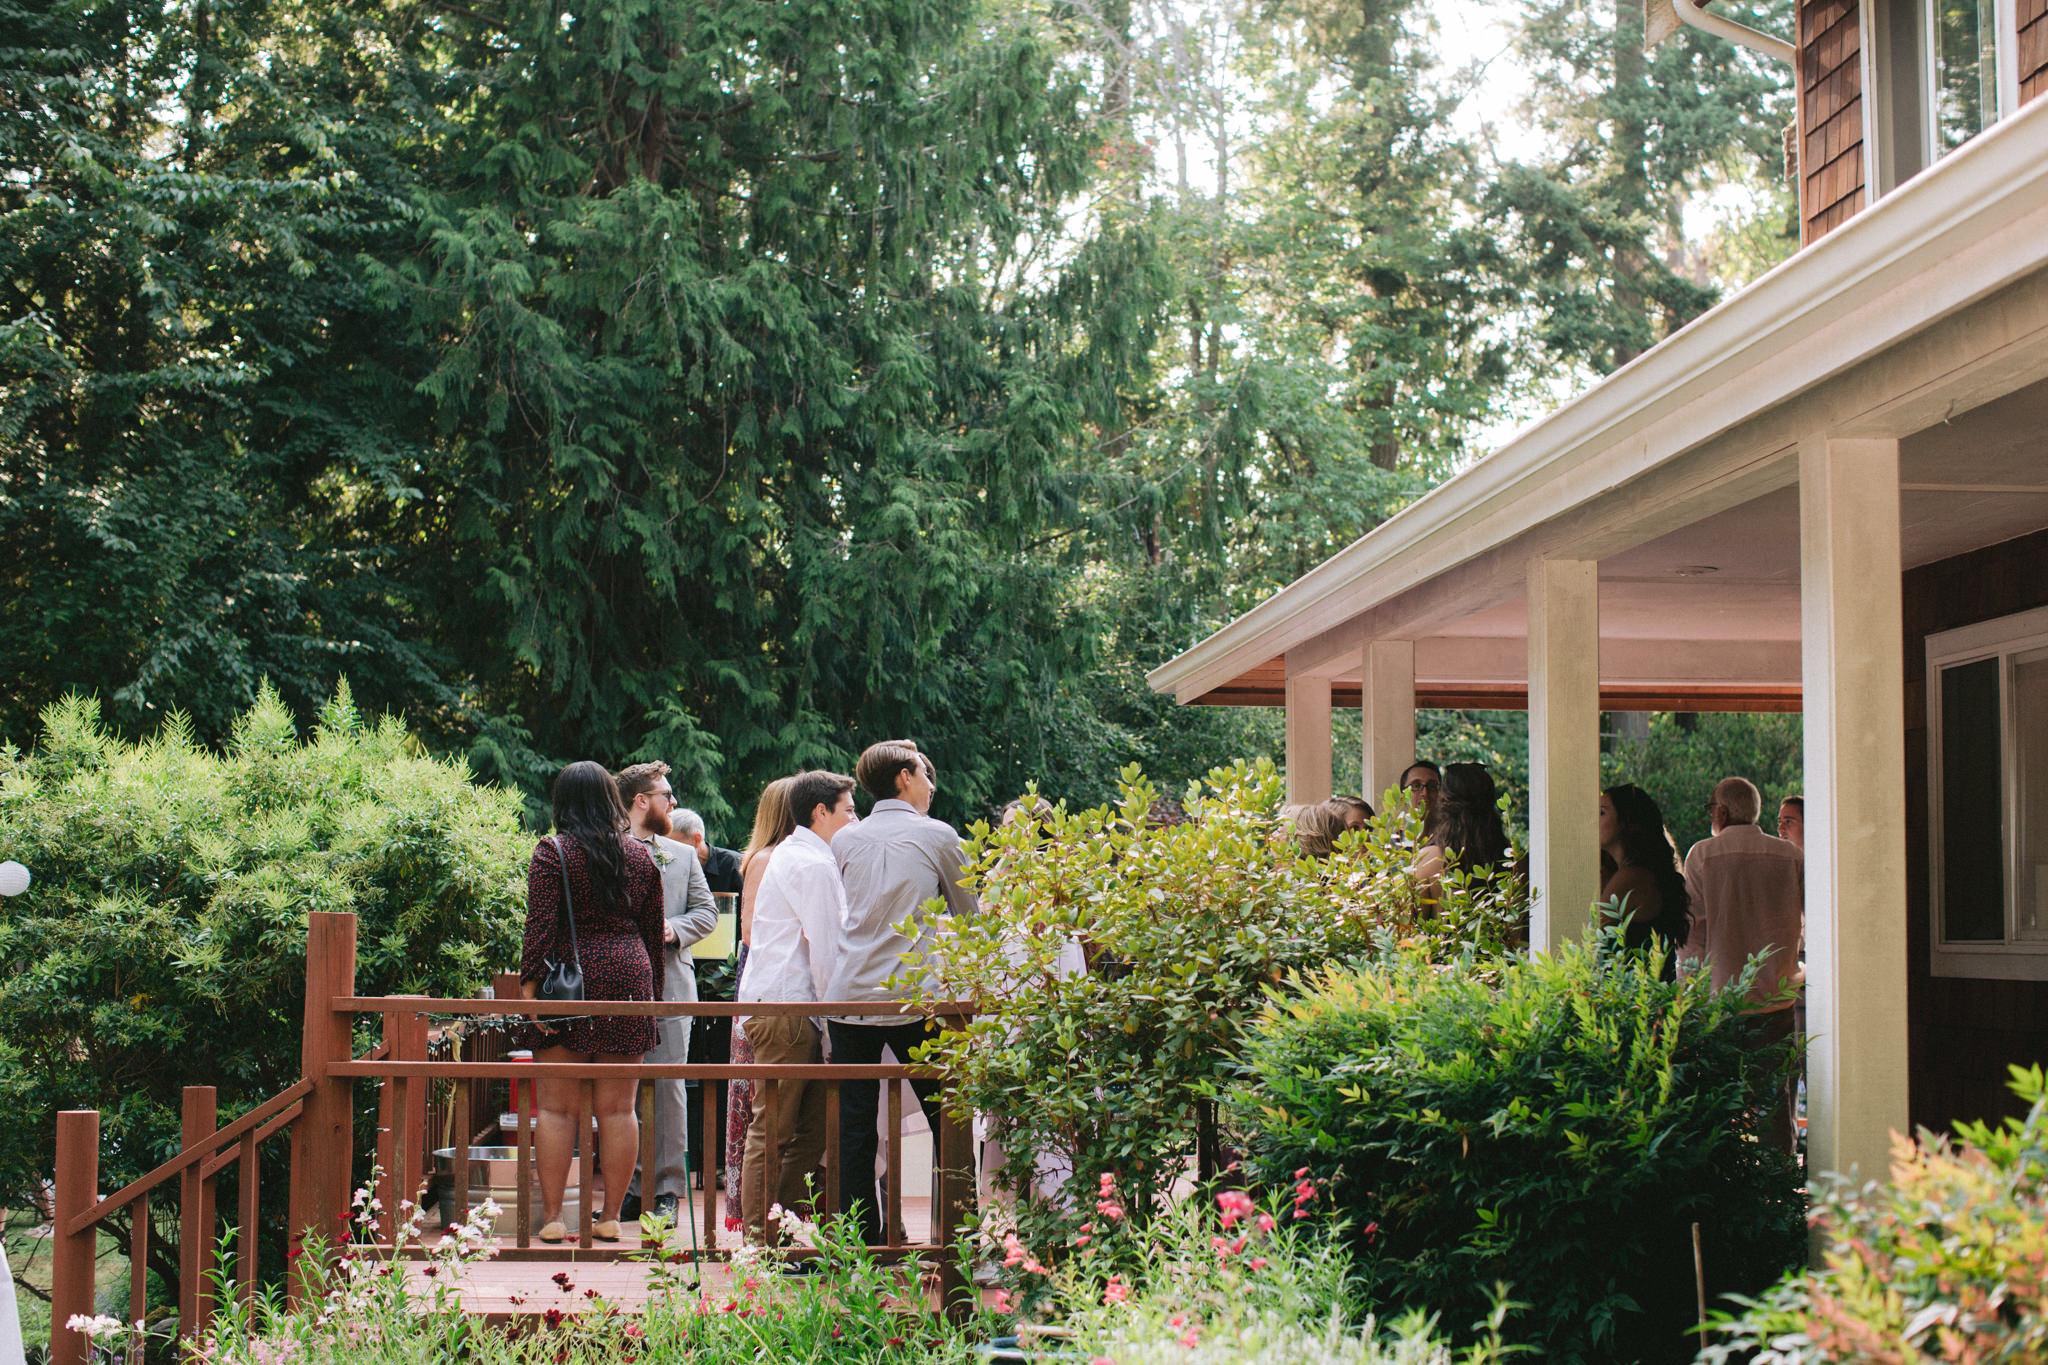 Backyard-Bainbridge-Island-Wedding-Alycia-Lovell-Photography-79.JPG